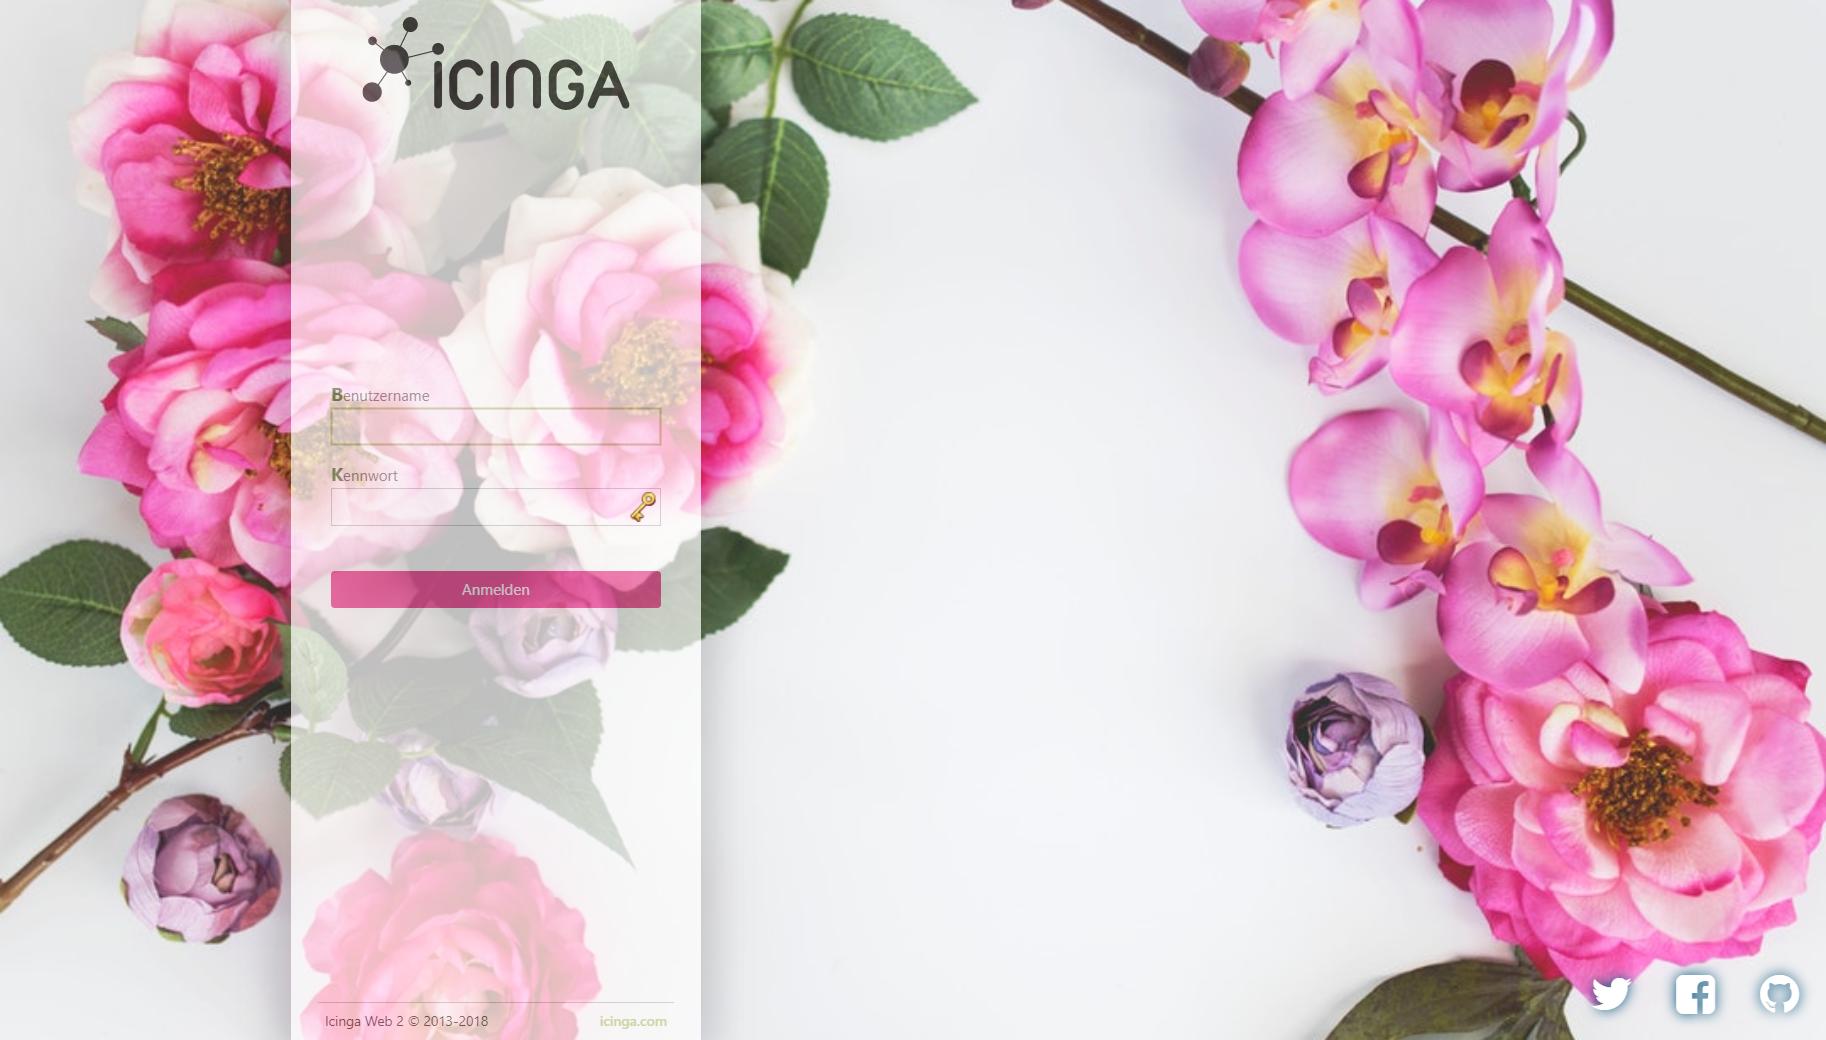 Icinga Web 2 theme Spring